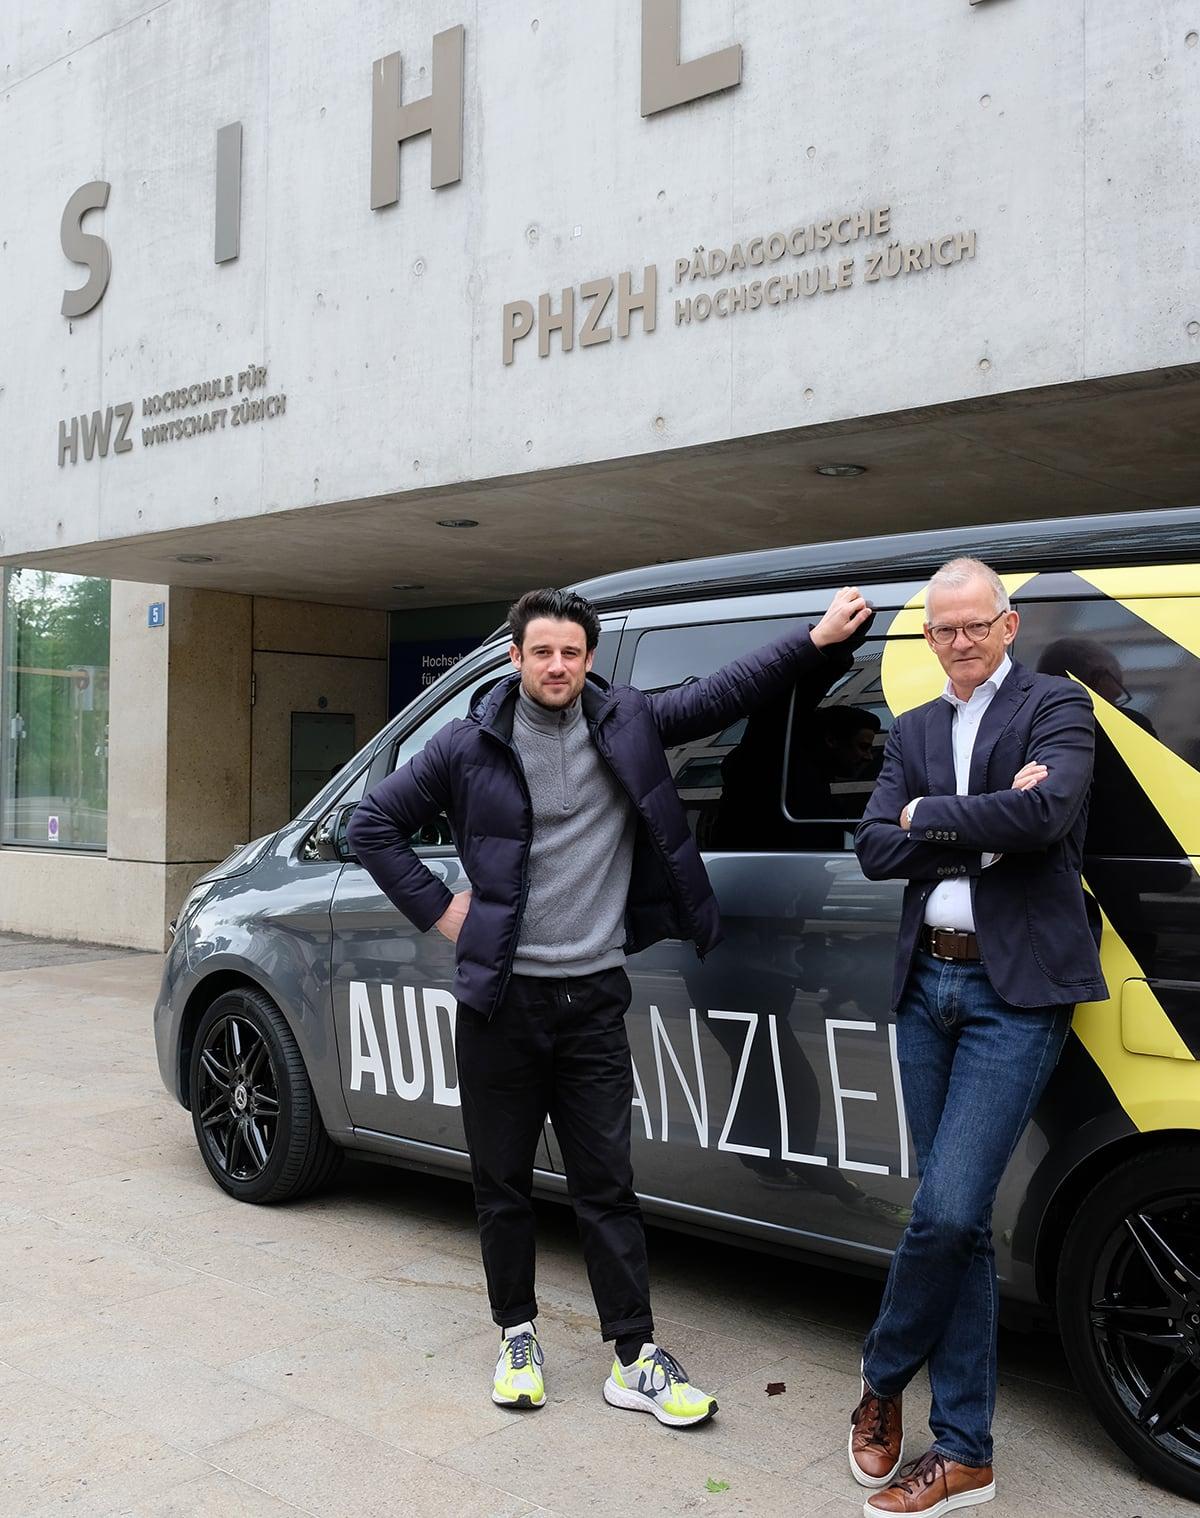 Beitrag podcar - Dino Giglio & Stefan Vogler | HWZ